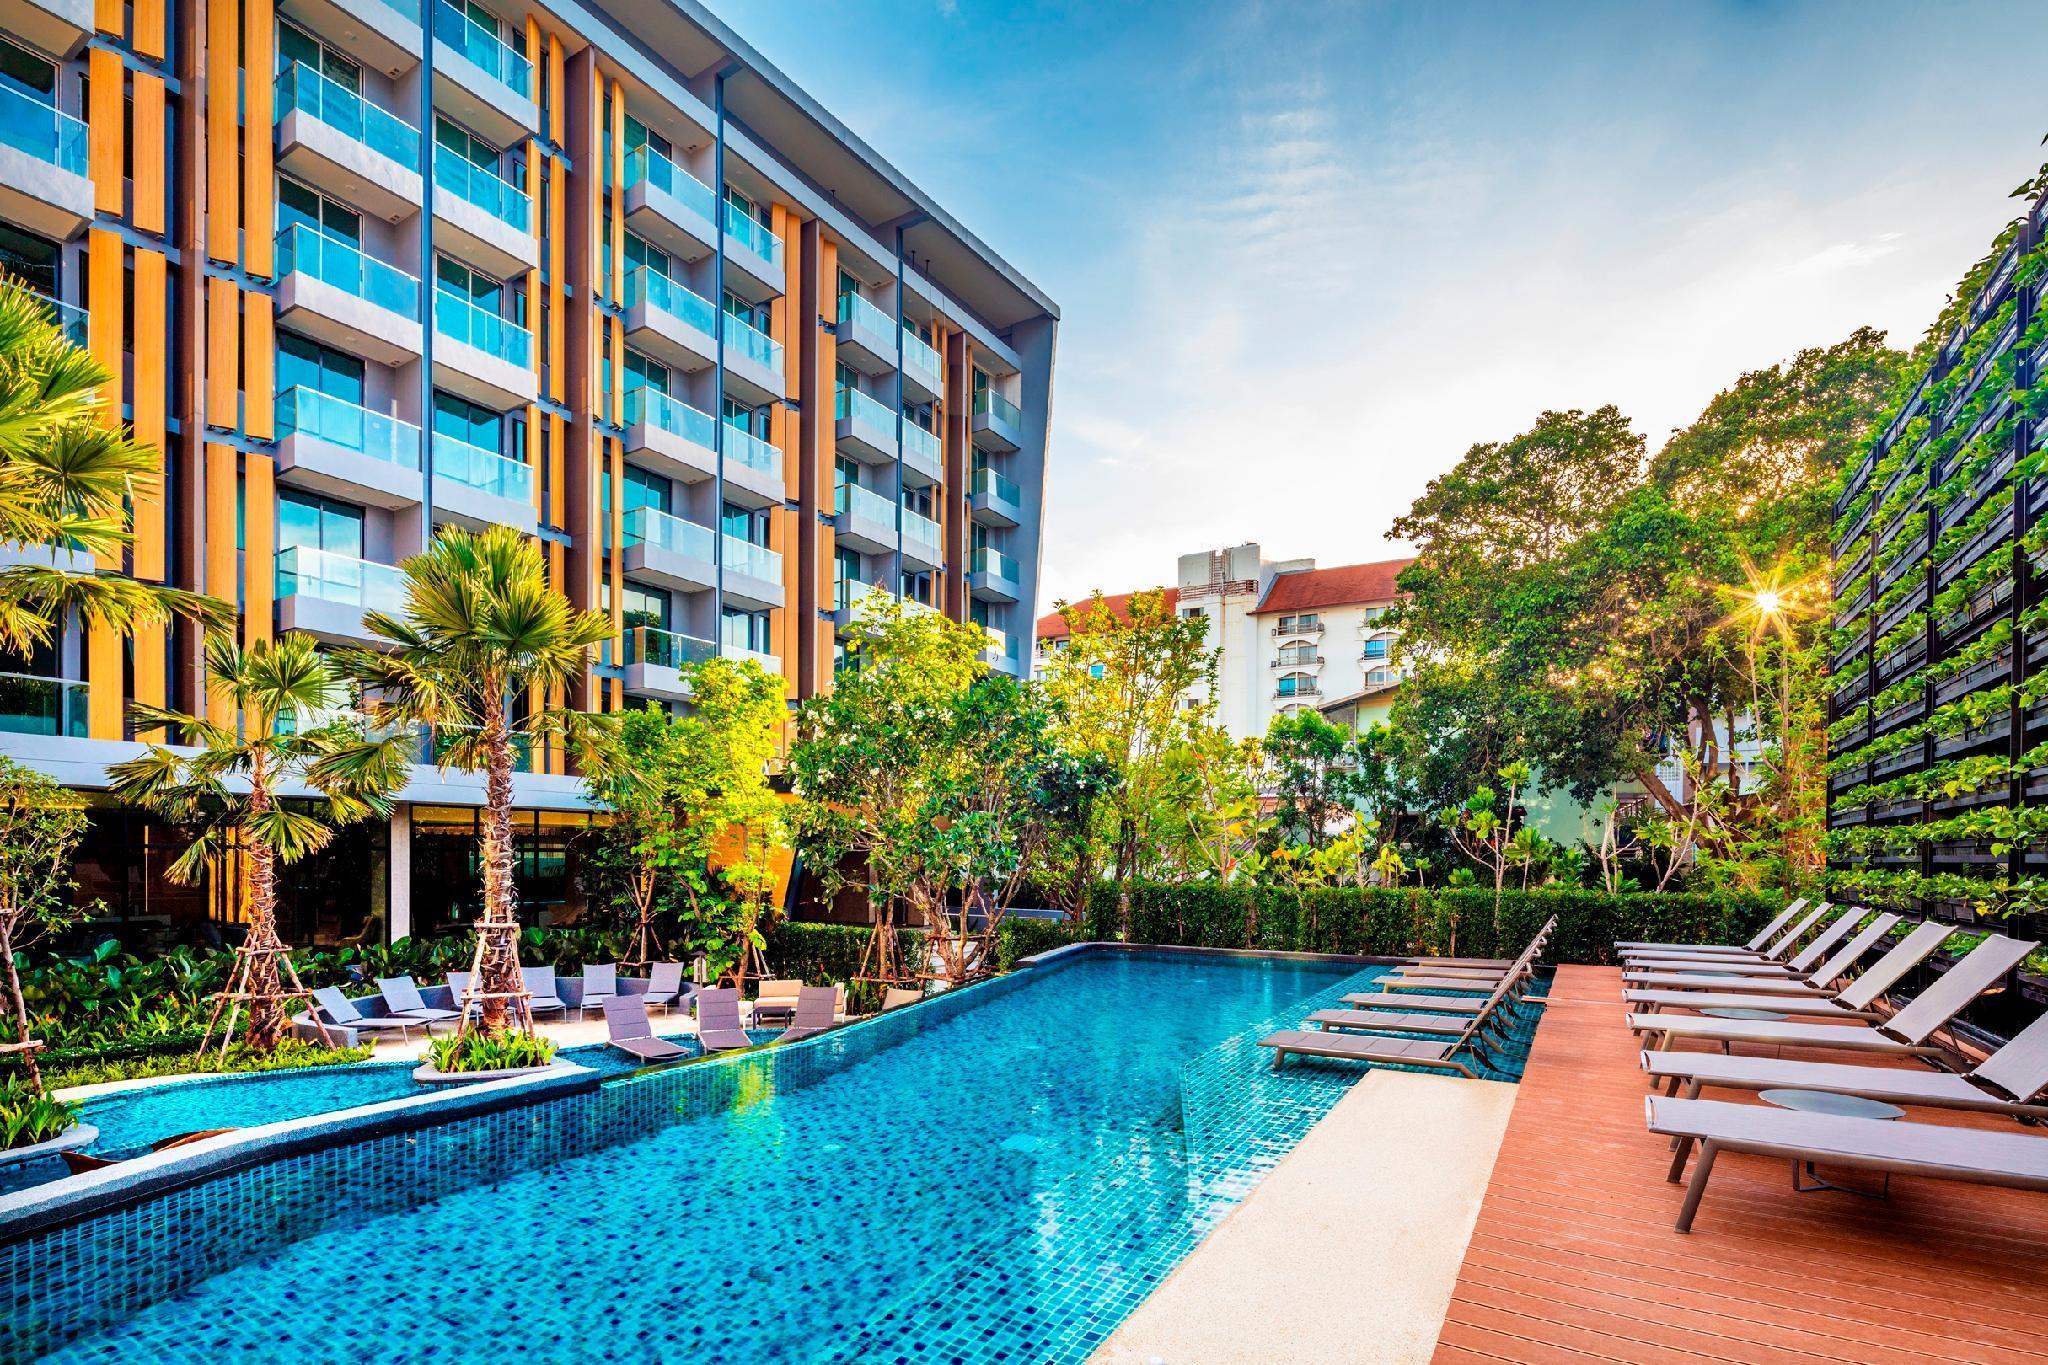 Hotel Amber Pattaya โรงแรมแอมเบอร์ พัทยา